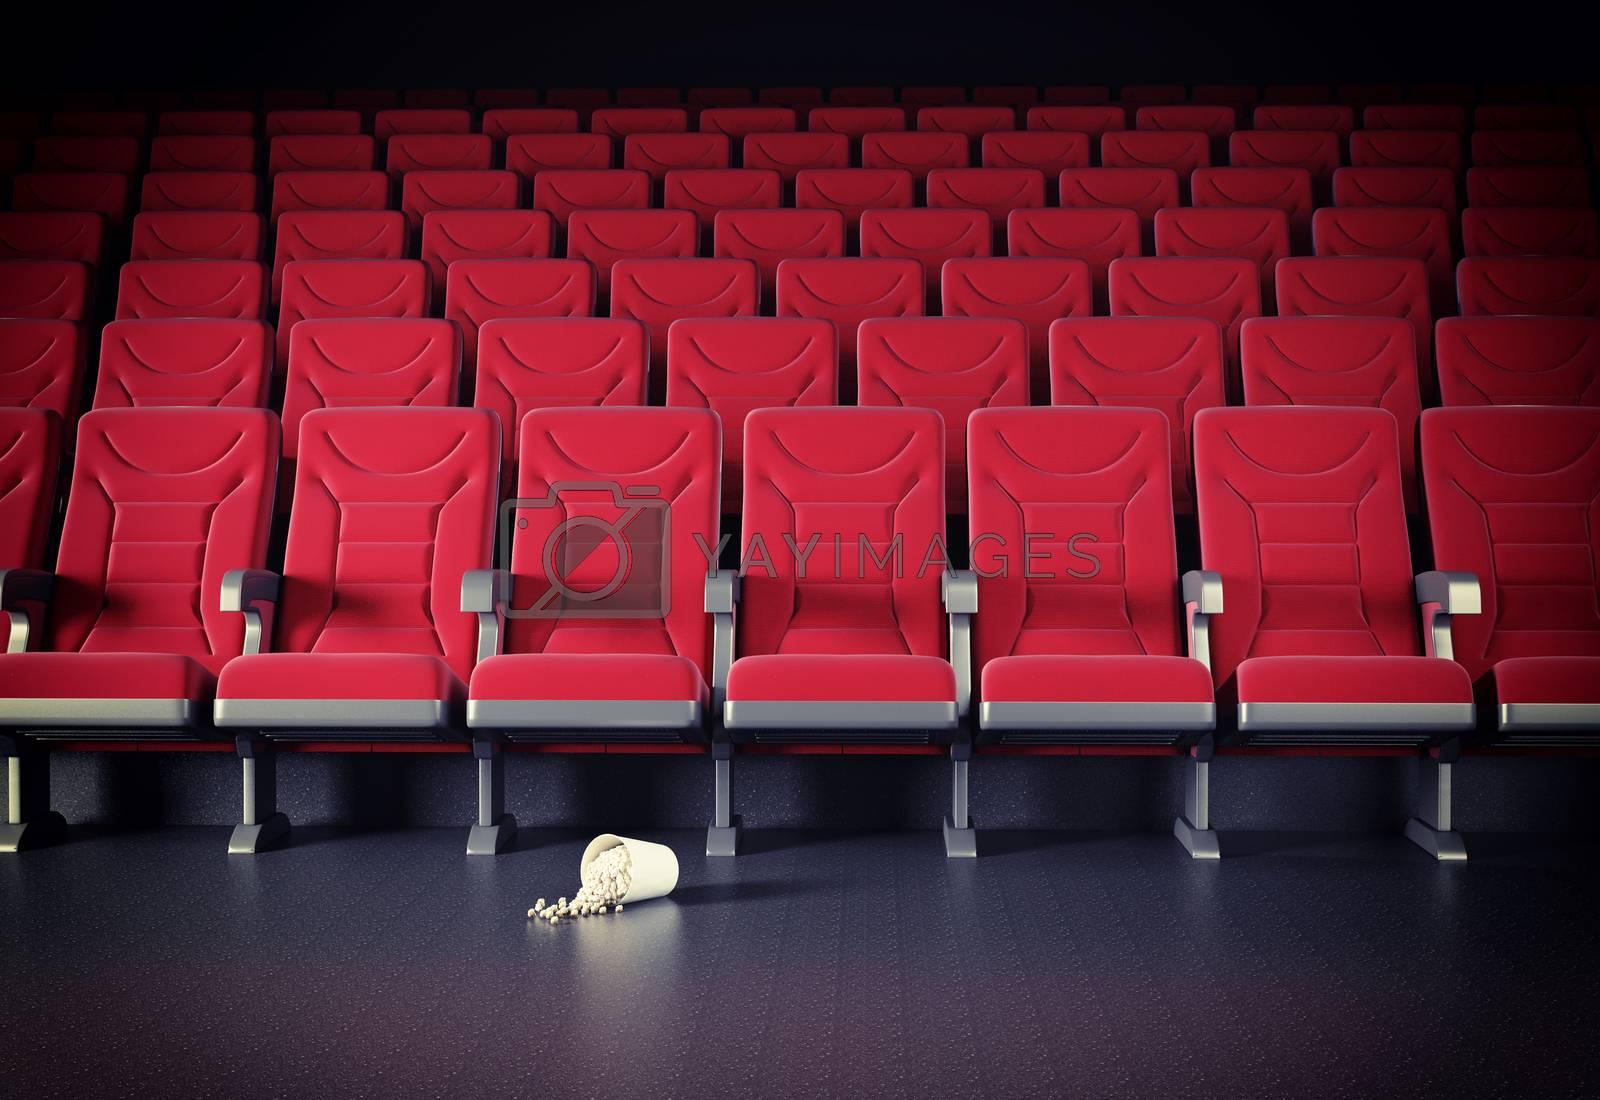 cinema interior and popcorn on the floor. cretive concept